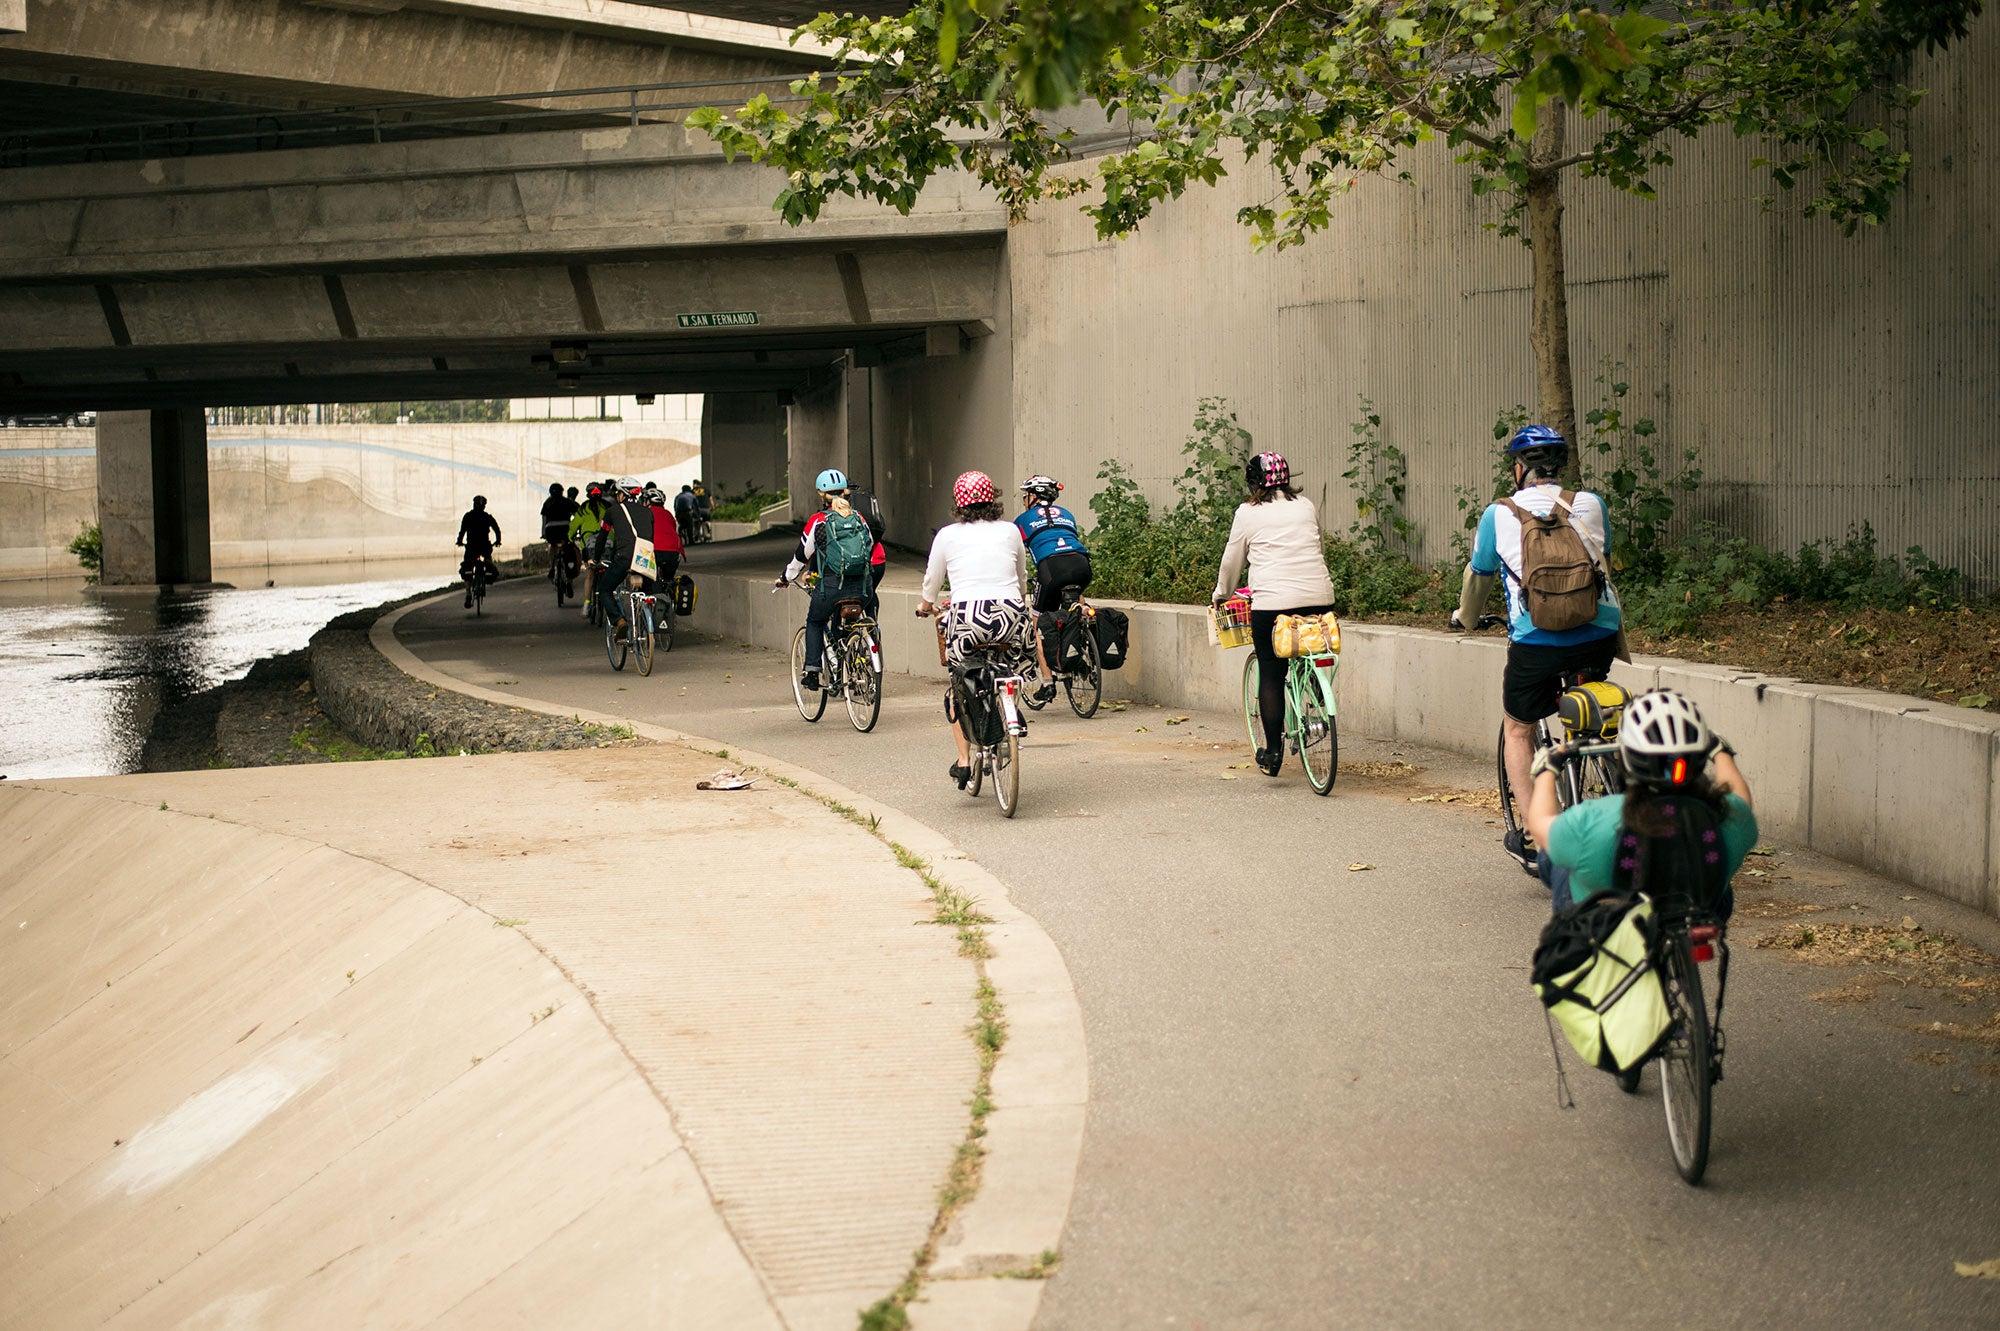 San Jose cyclists